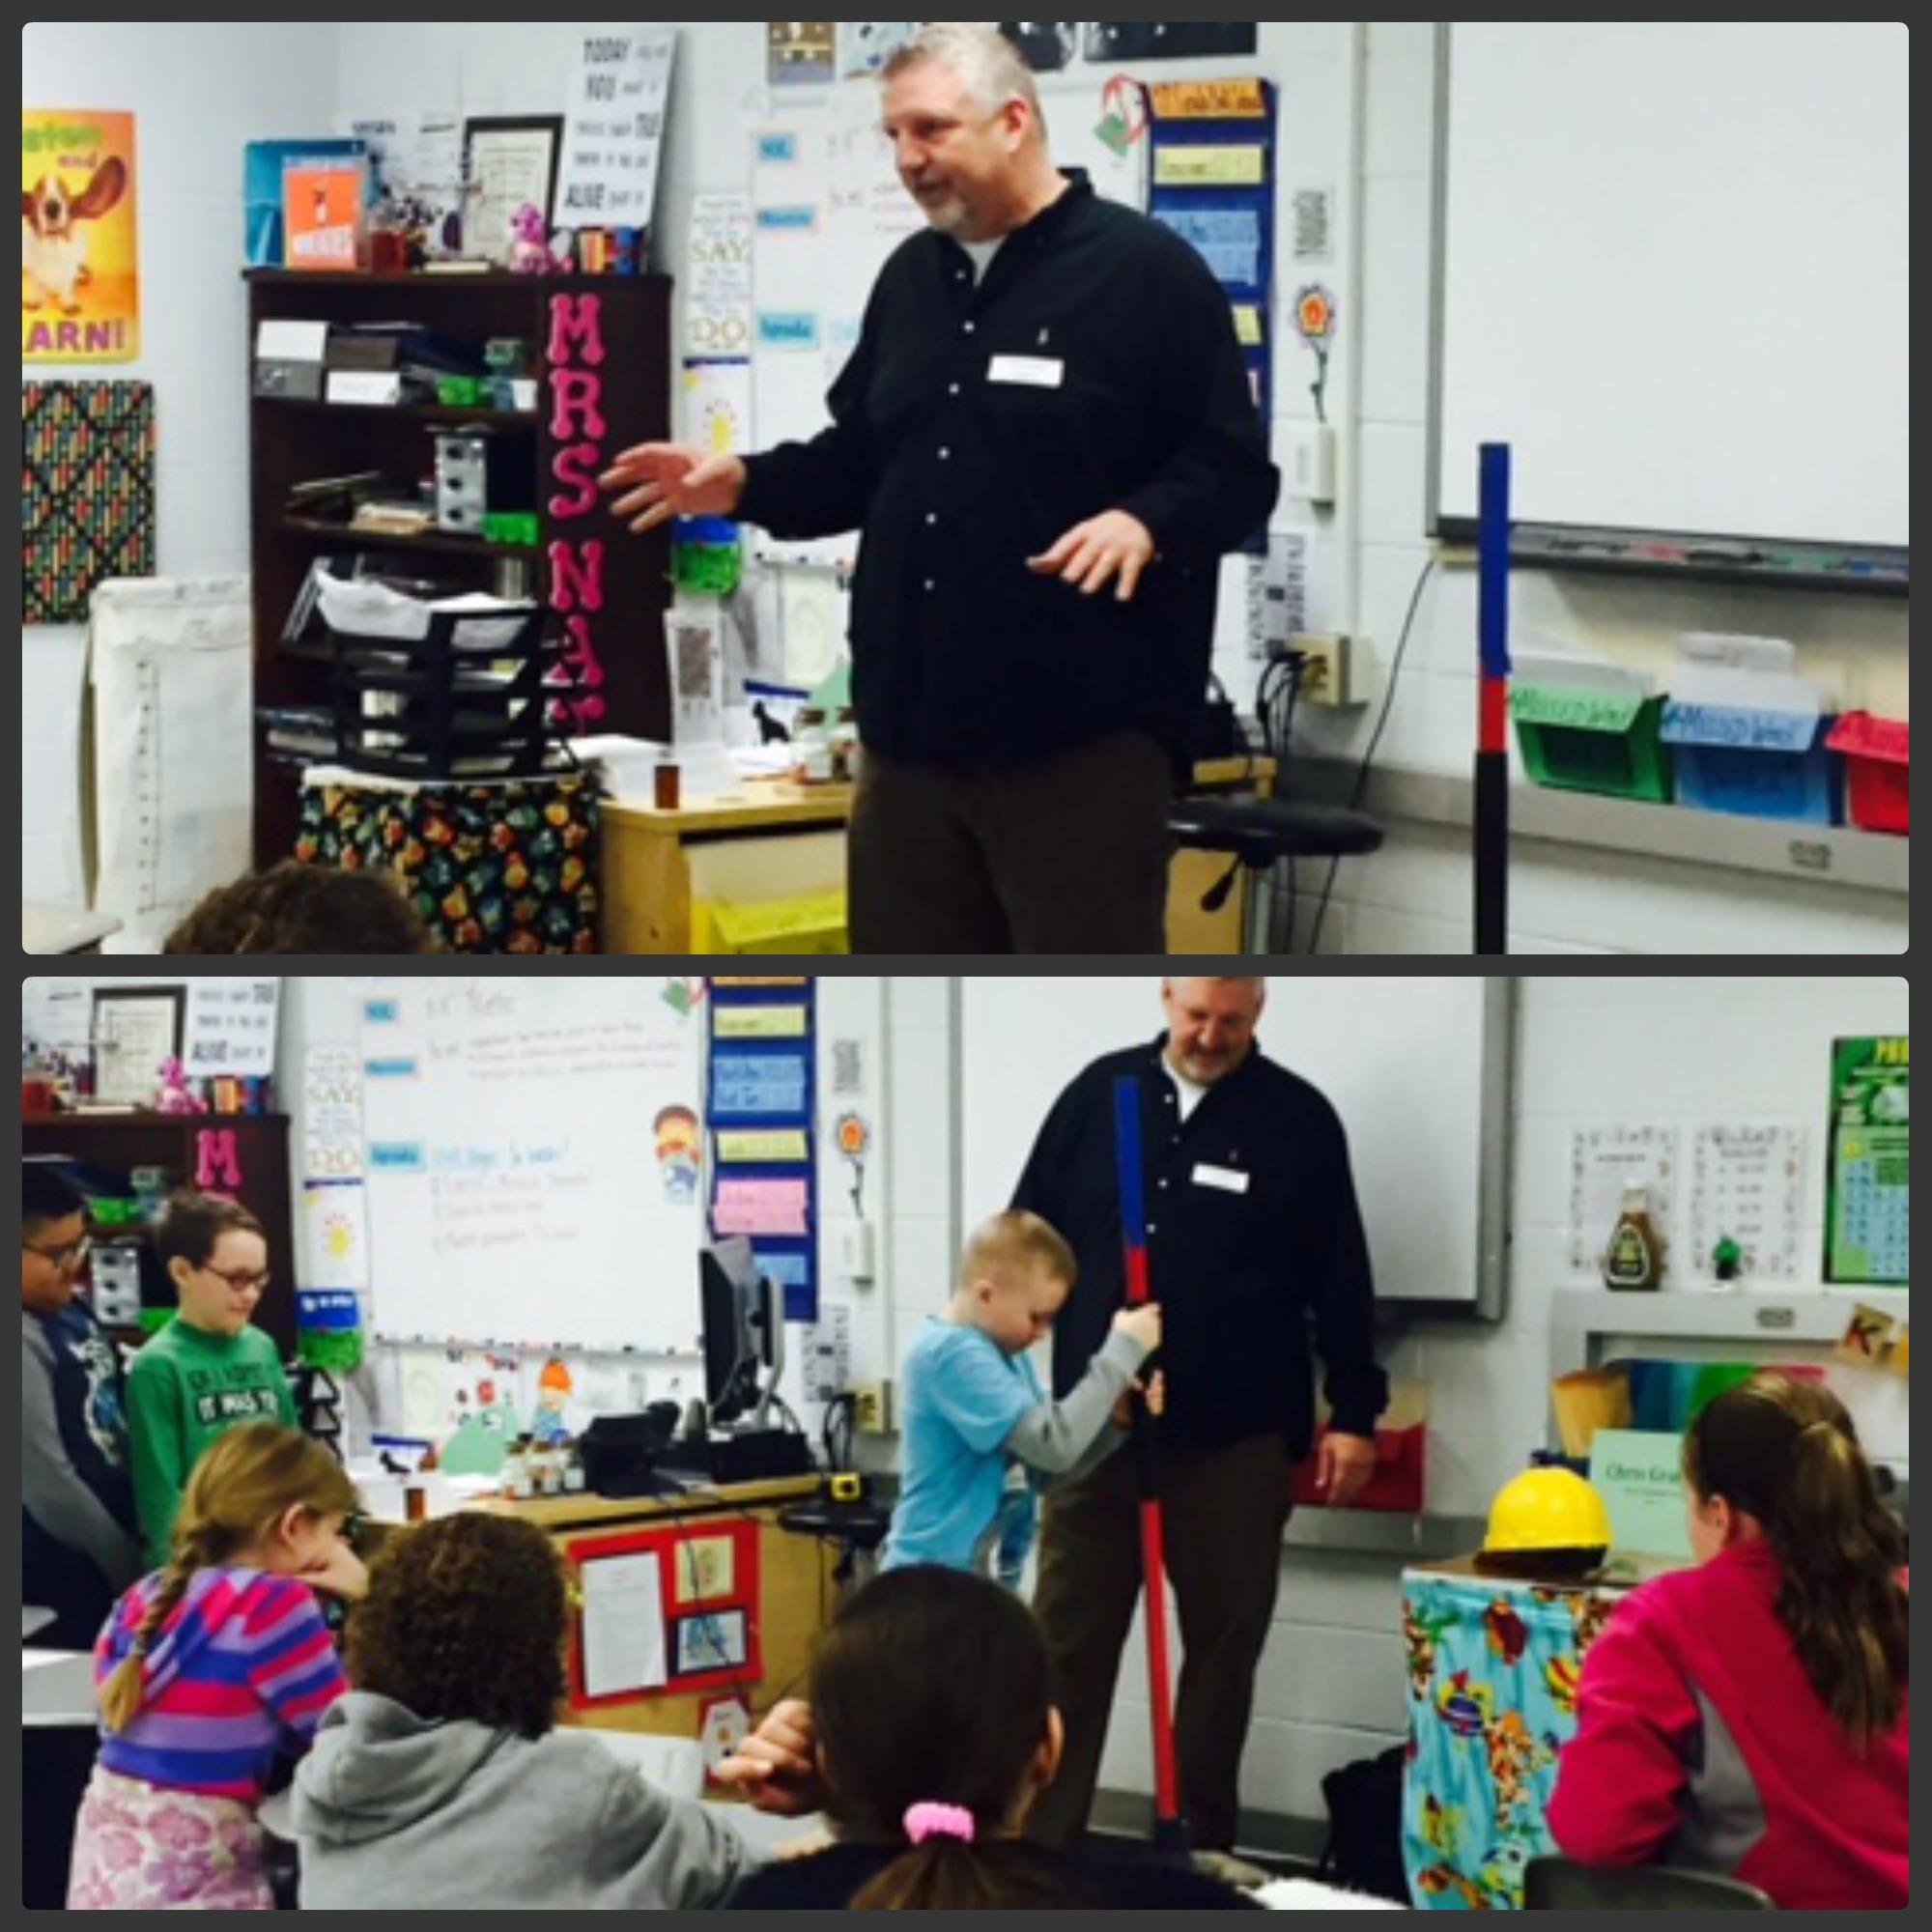 Career Day at Daniel Morgan Middle School